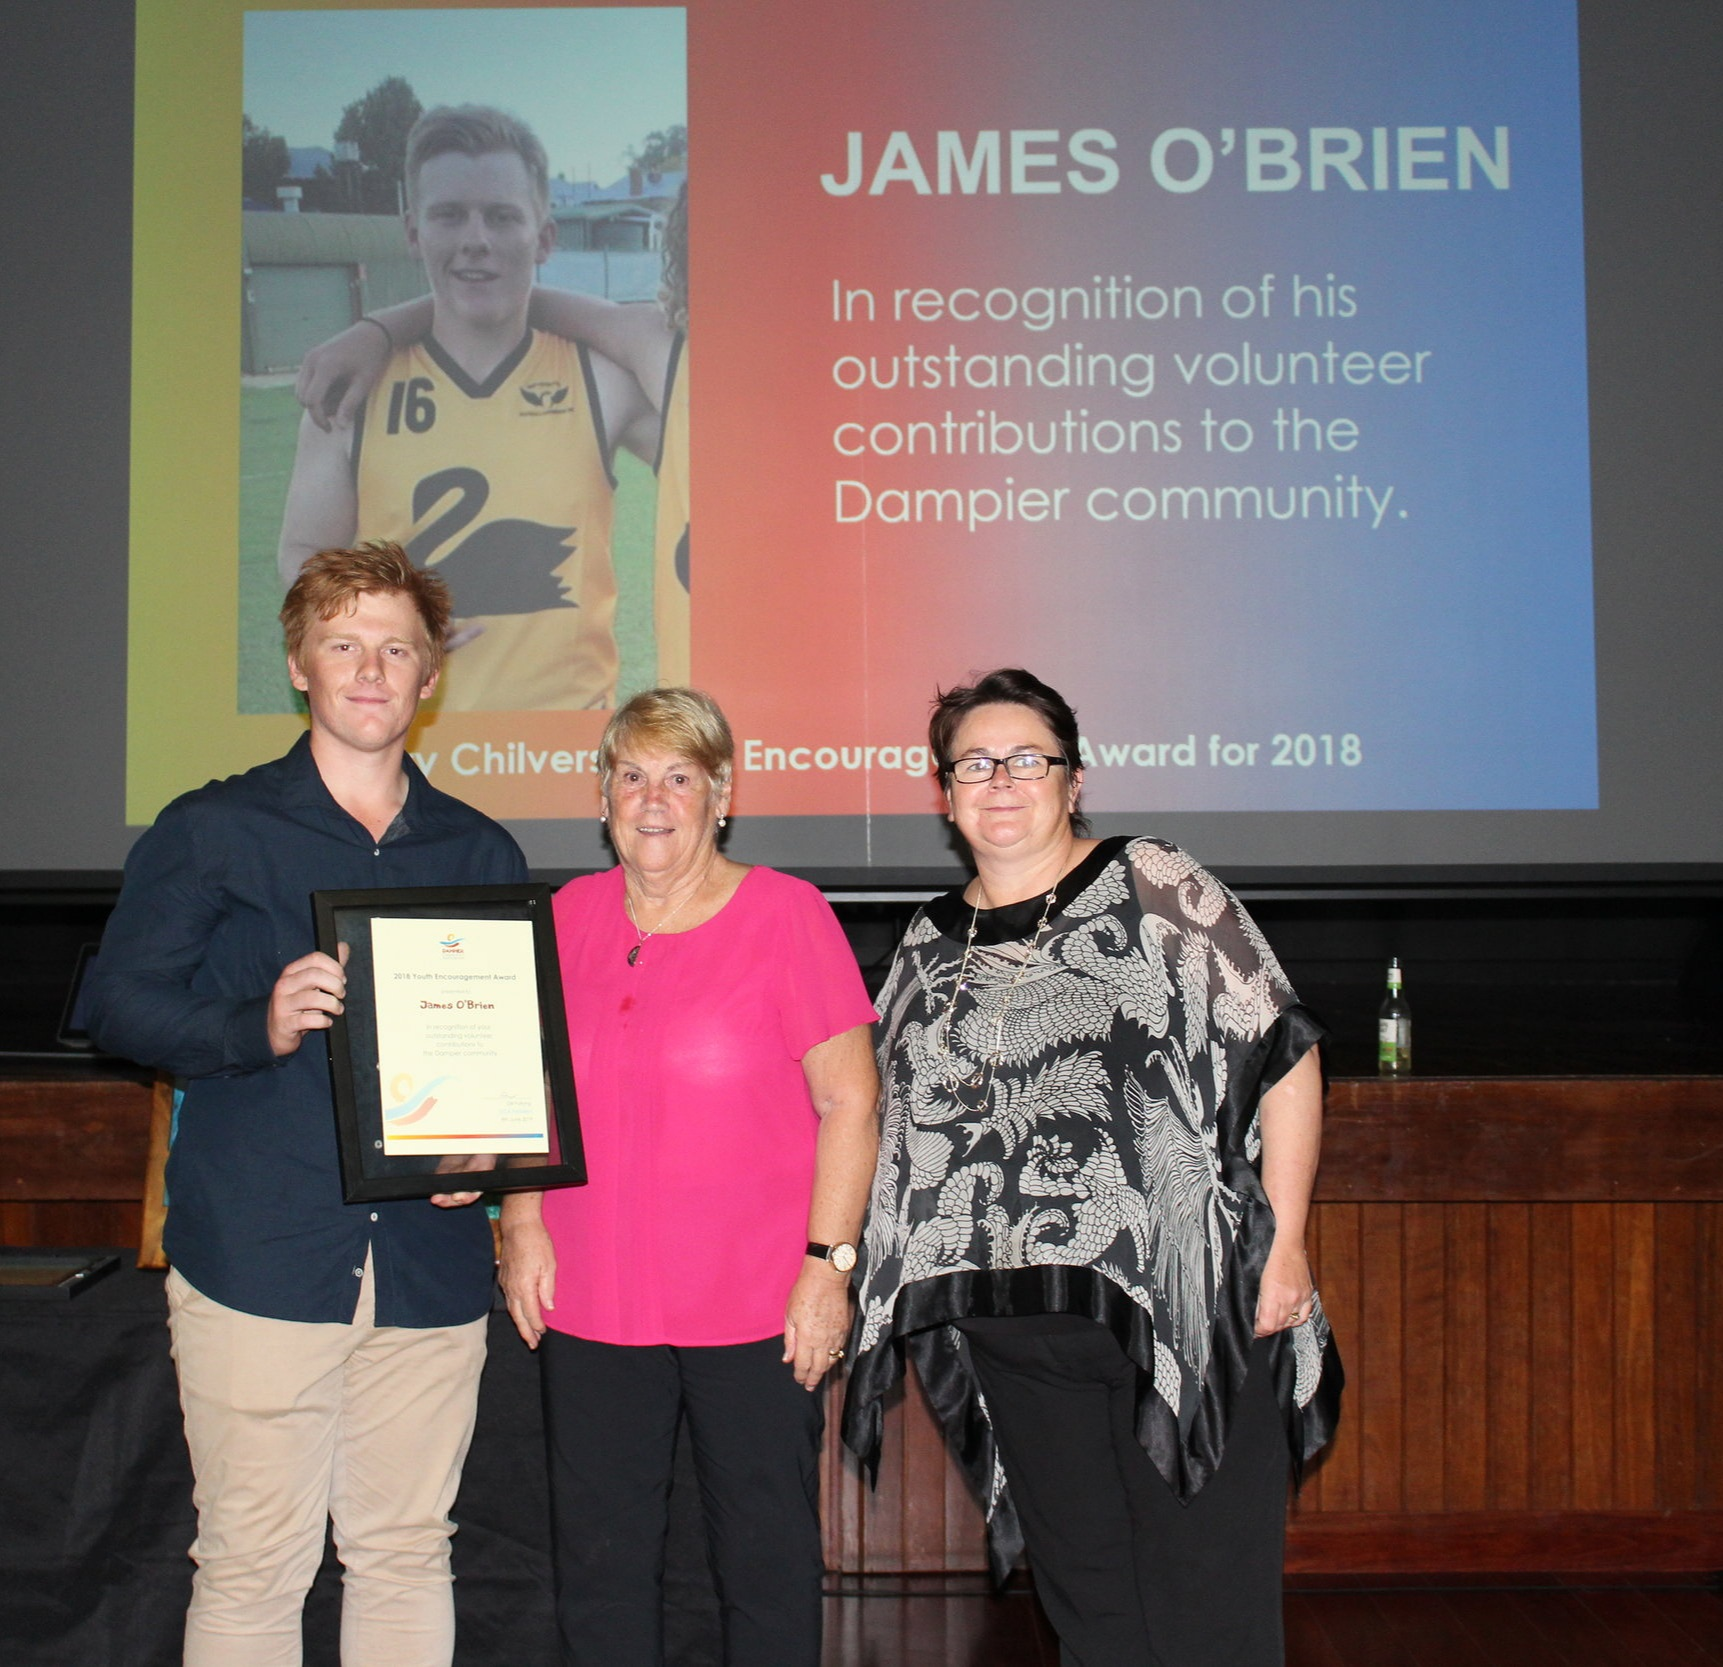 2018 Harry Chilvers Youth Encouragement Award Winner :  Jimmy O' Brien, Jean Chilvers, Gill Furlong